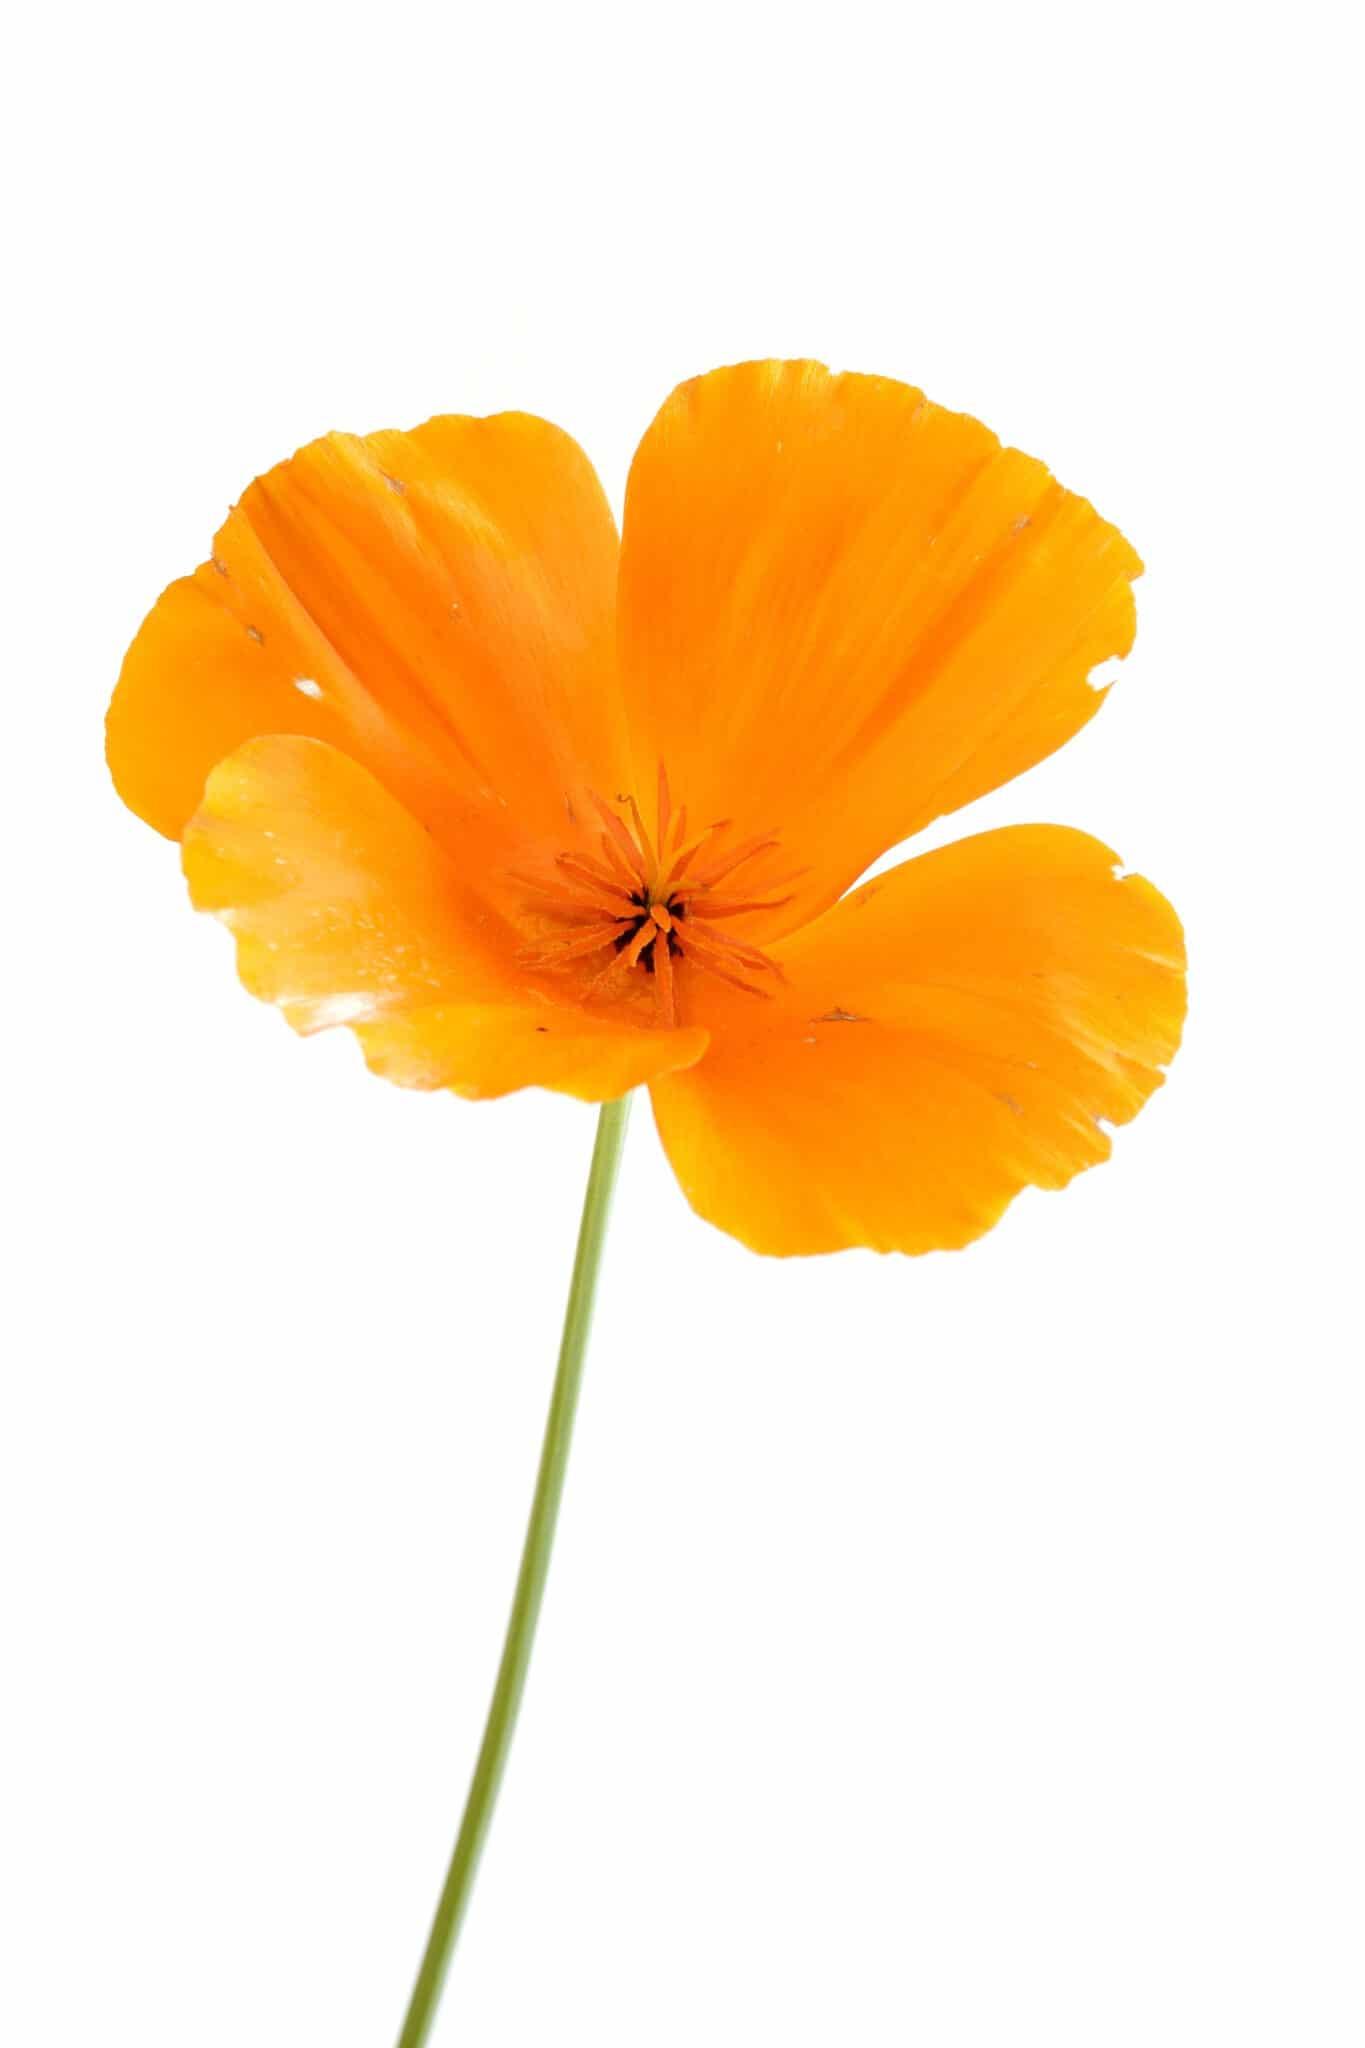 Bright yellow-orange california poppy against a bright white background.